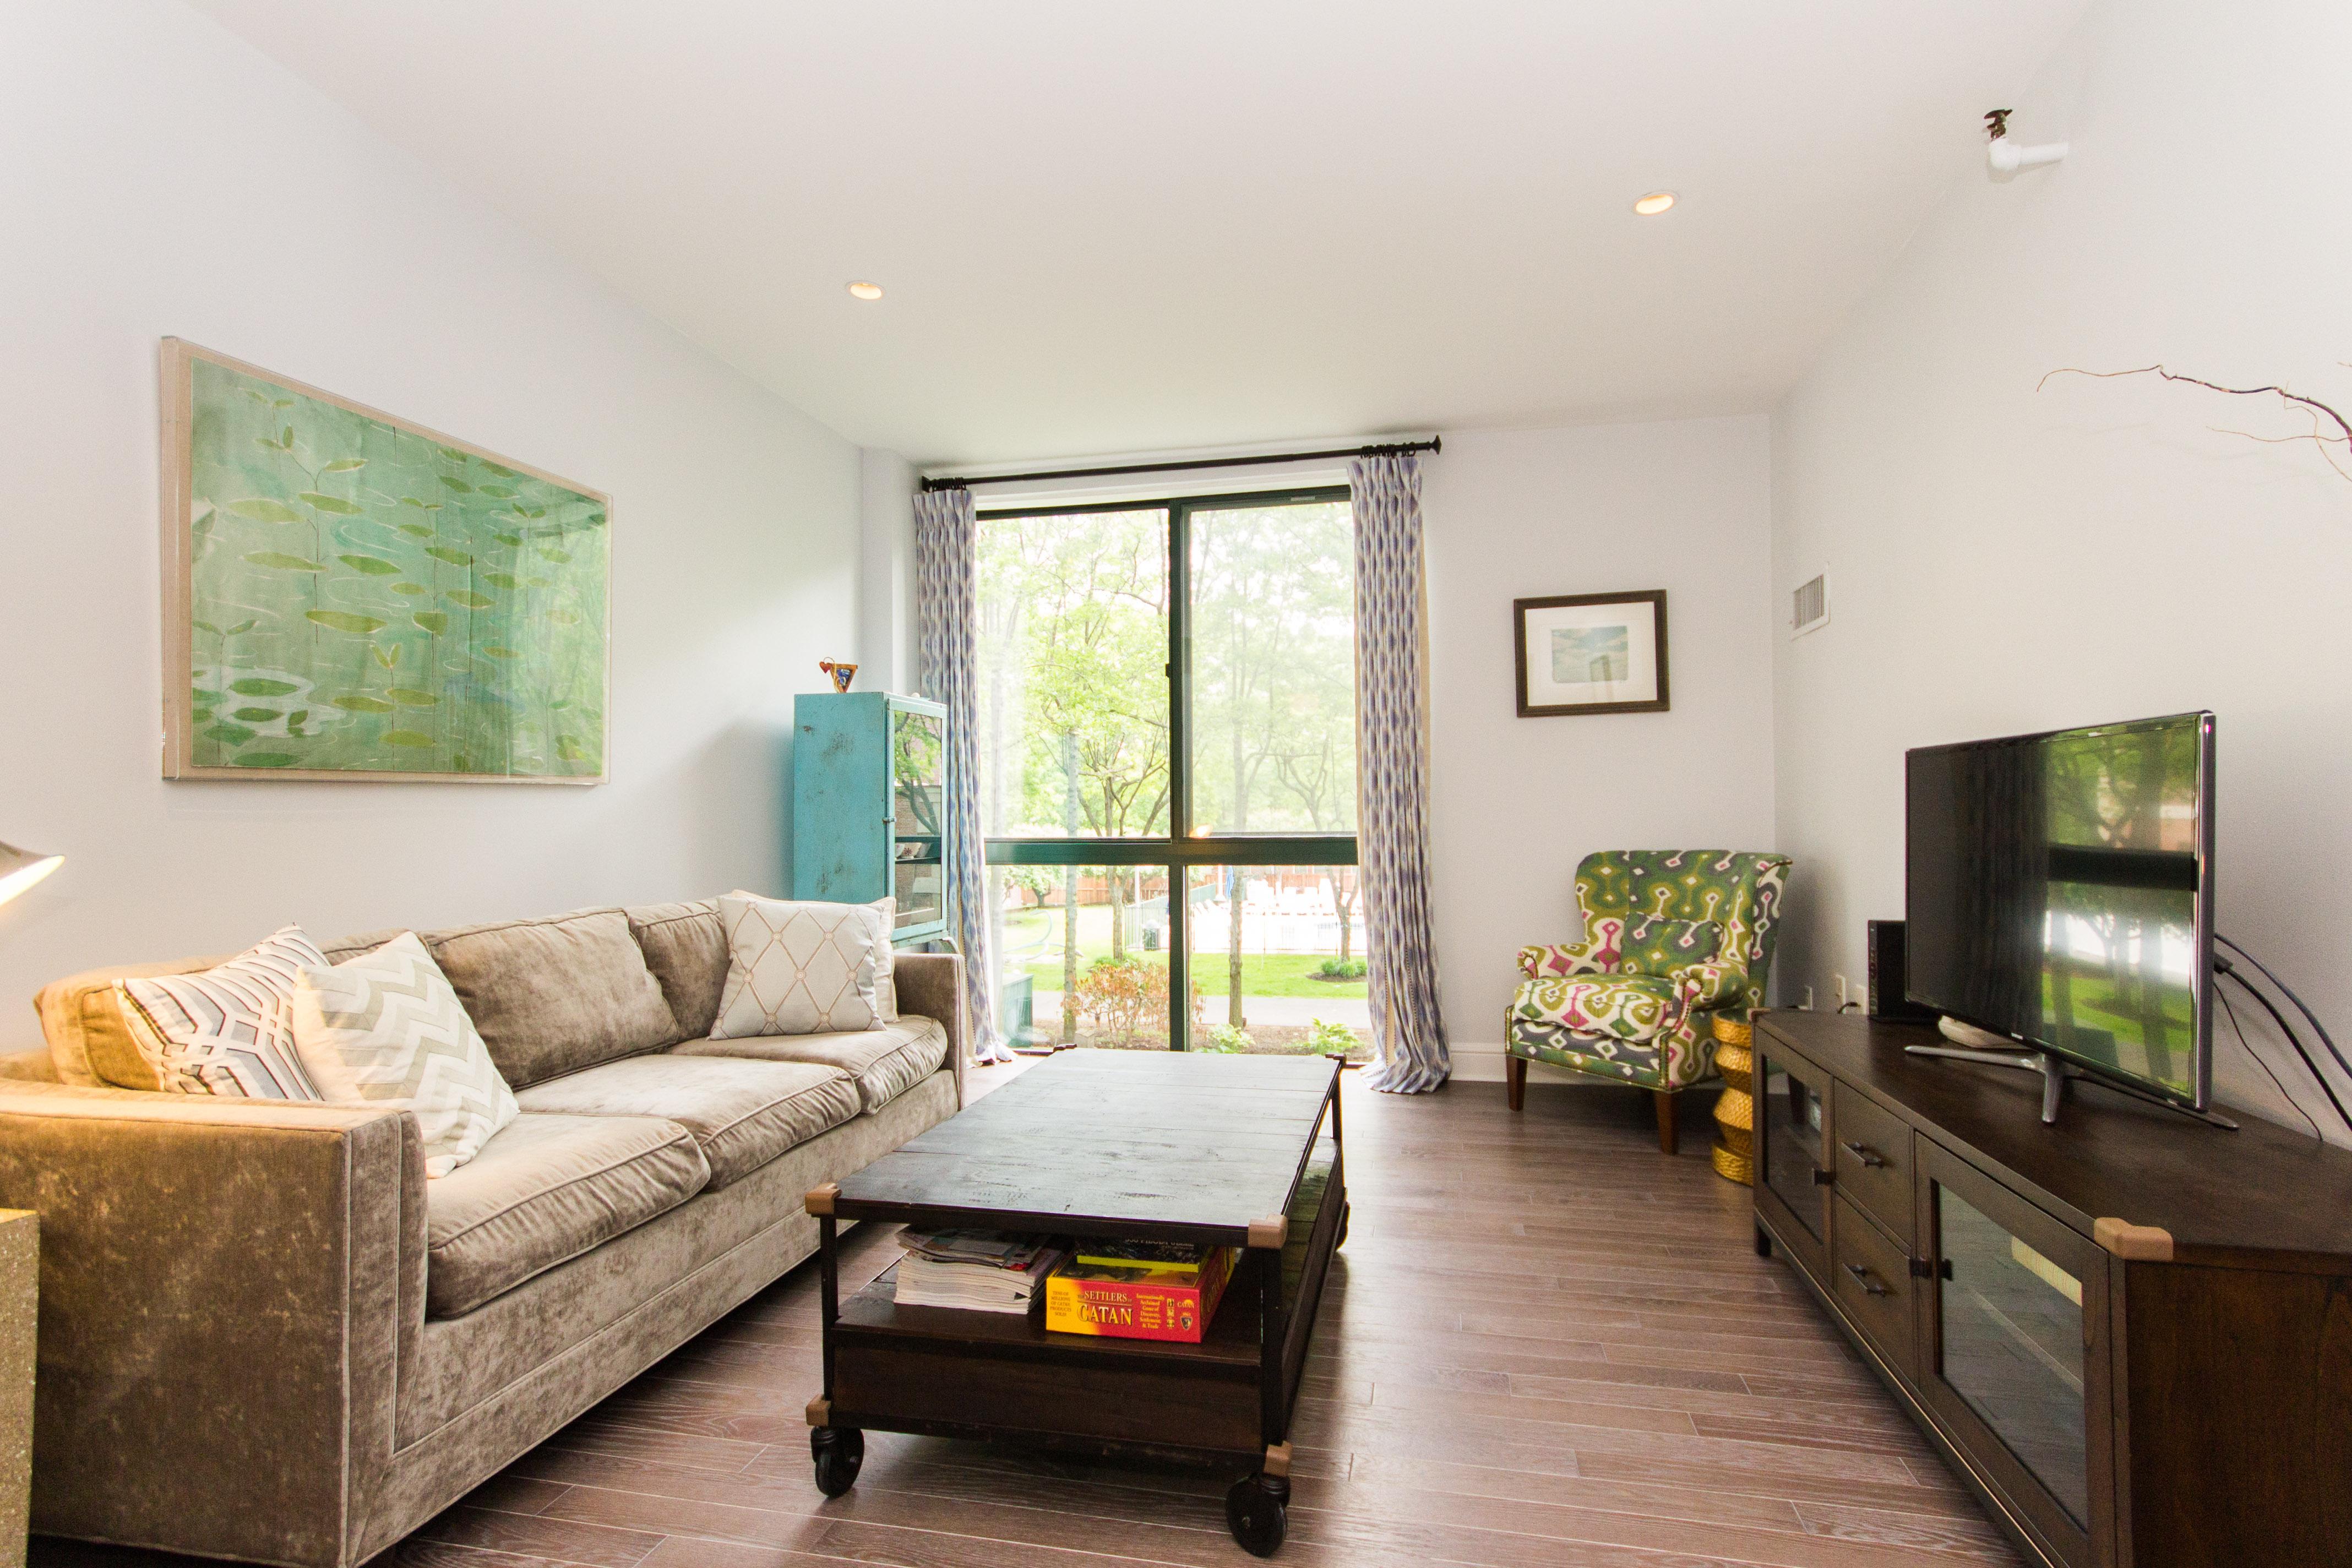 Condominium for Sale at 42 Eigth Street Unit 3203 42 Eighth Street Unit 3203 Boston, Massachusetts 02129 United States